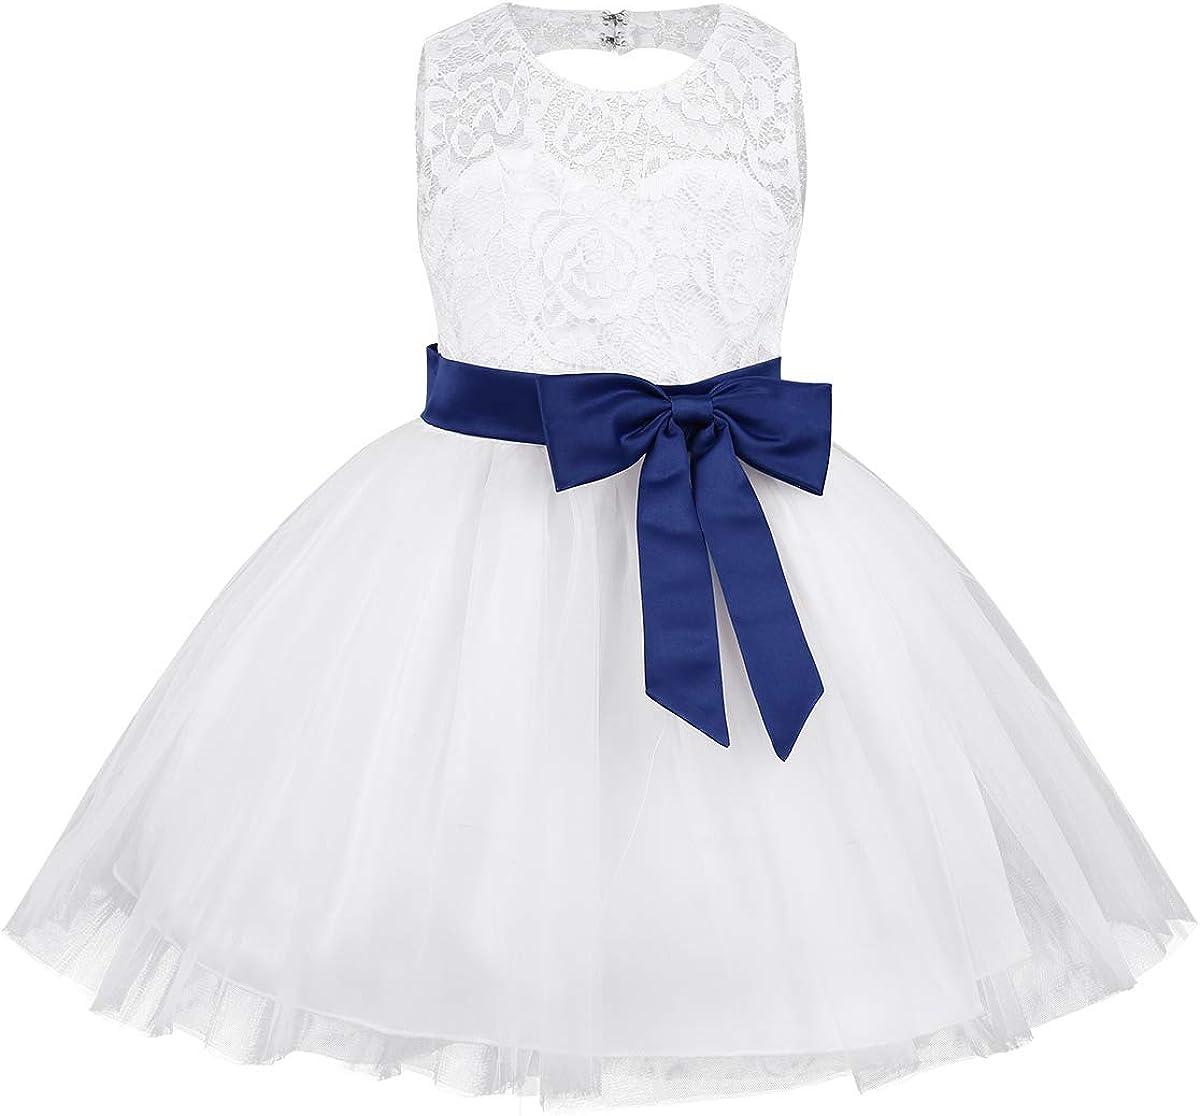 Freebily Baby Girls Superlatite Lace Dress Directly managed store B Bowknot Princess Flower Dresses